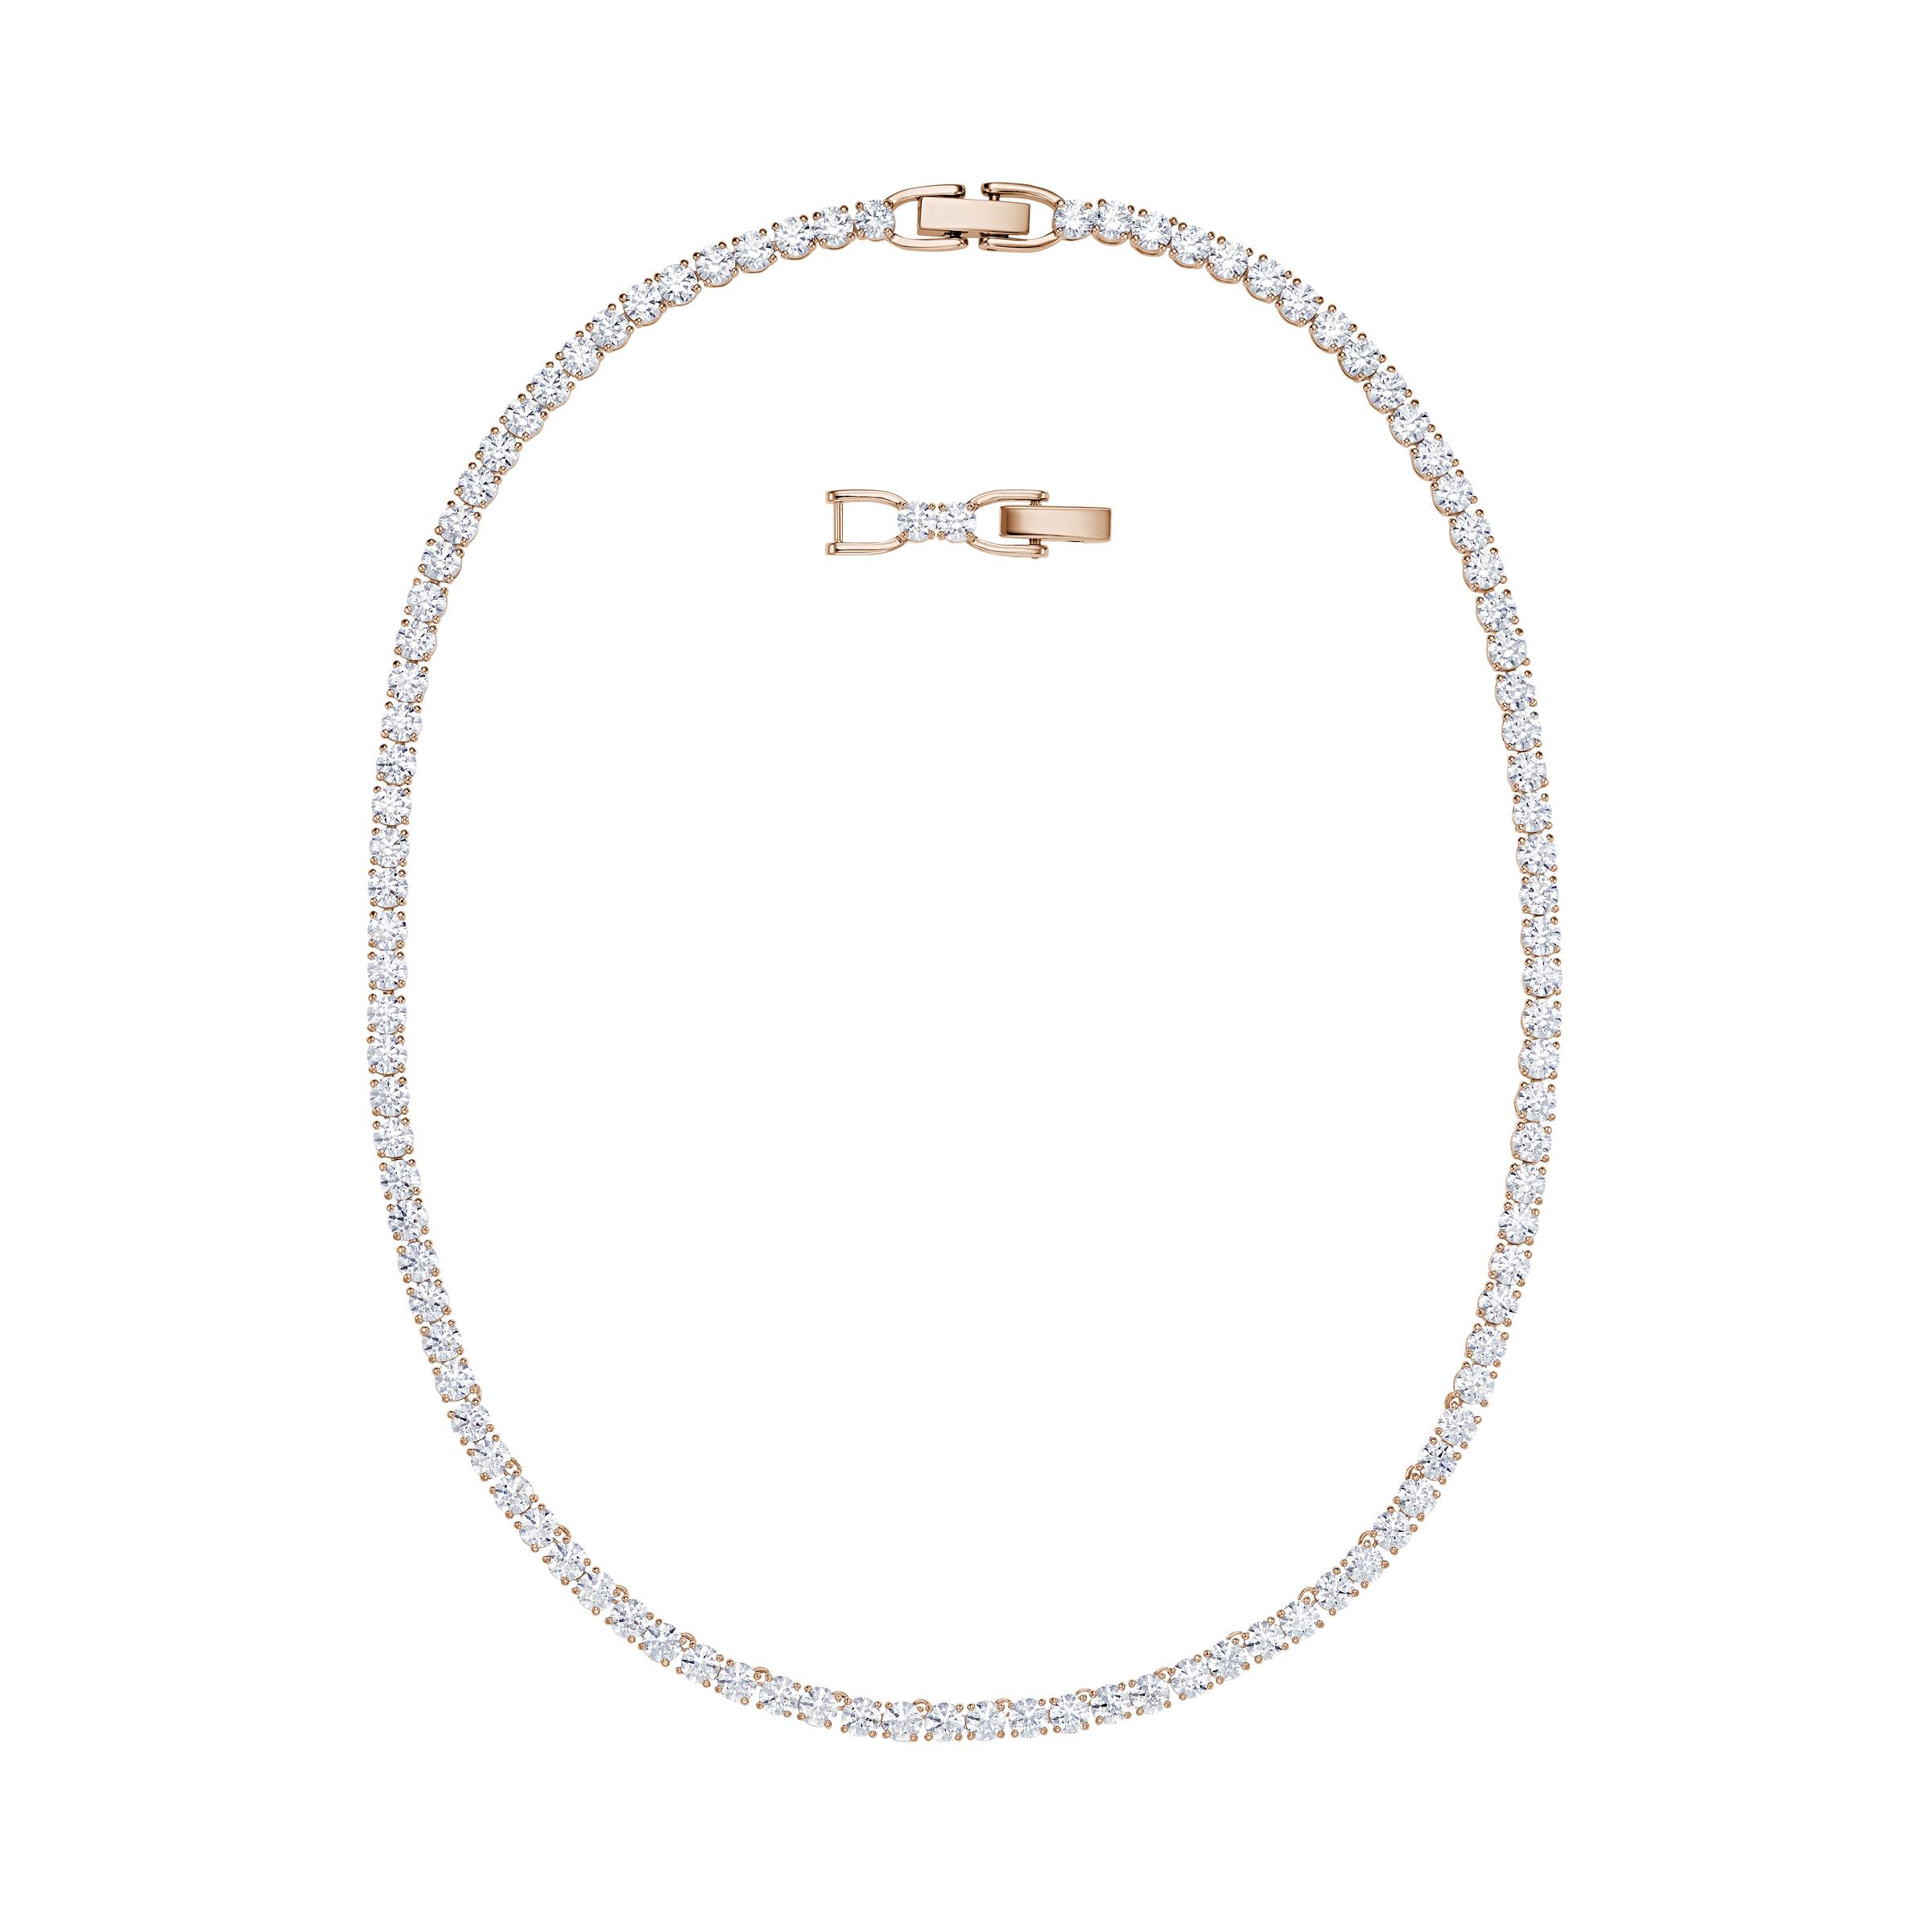 Collier Tennis Deluxe, blanc, Métal doré rose, Swarovski